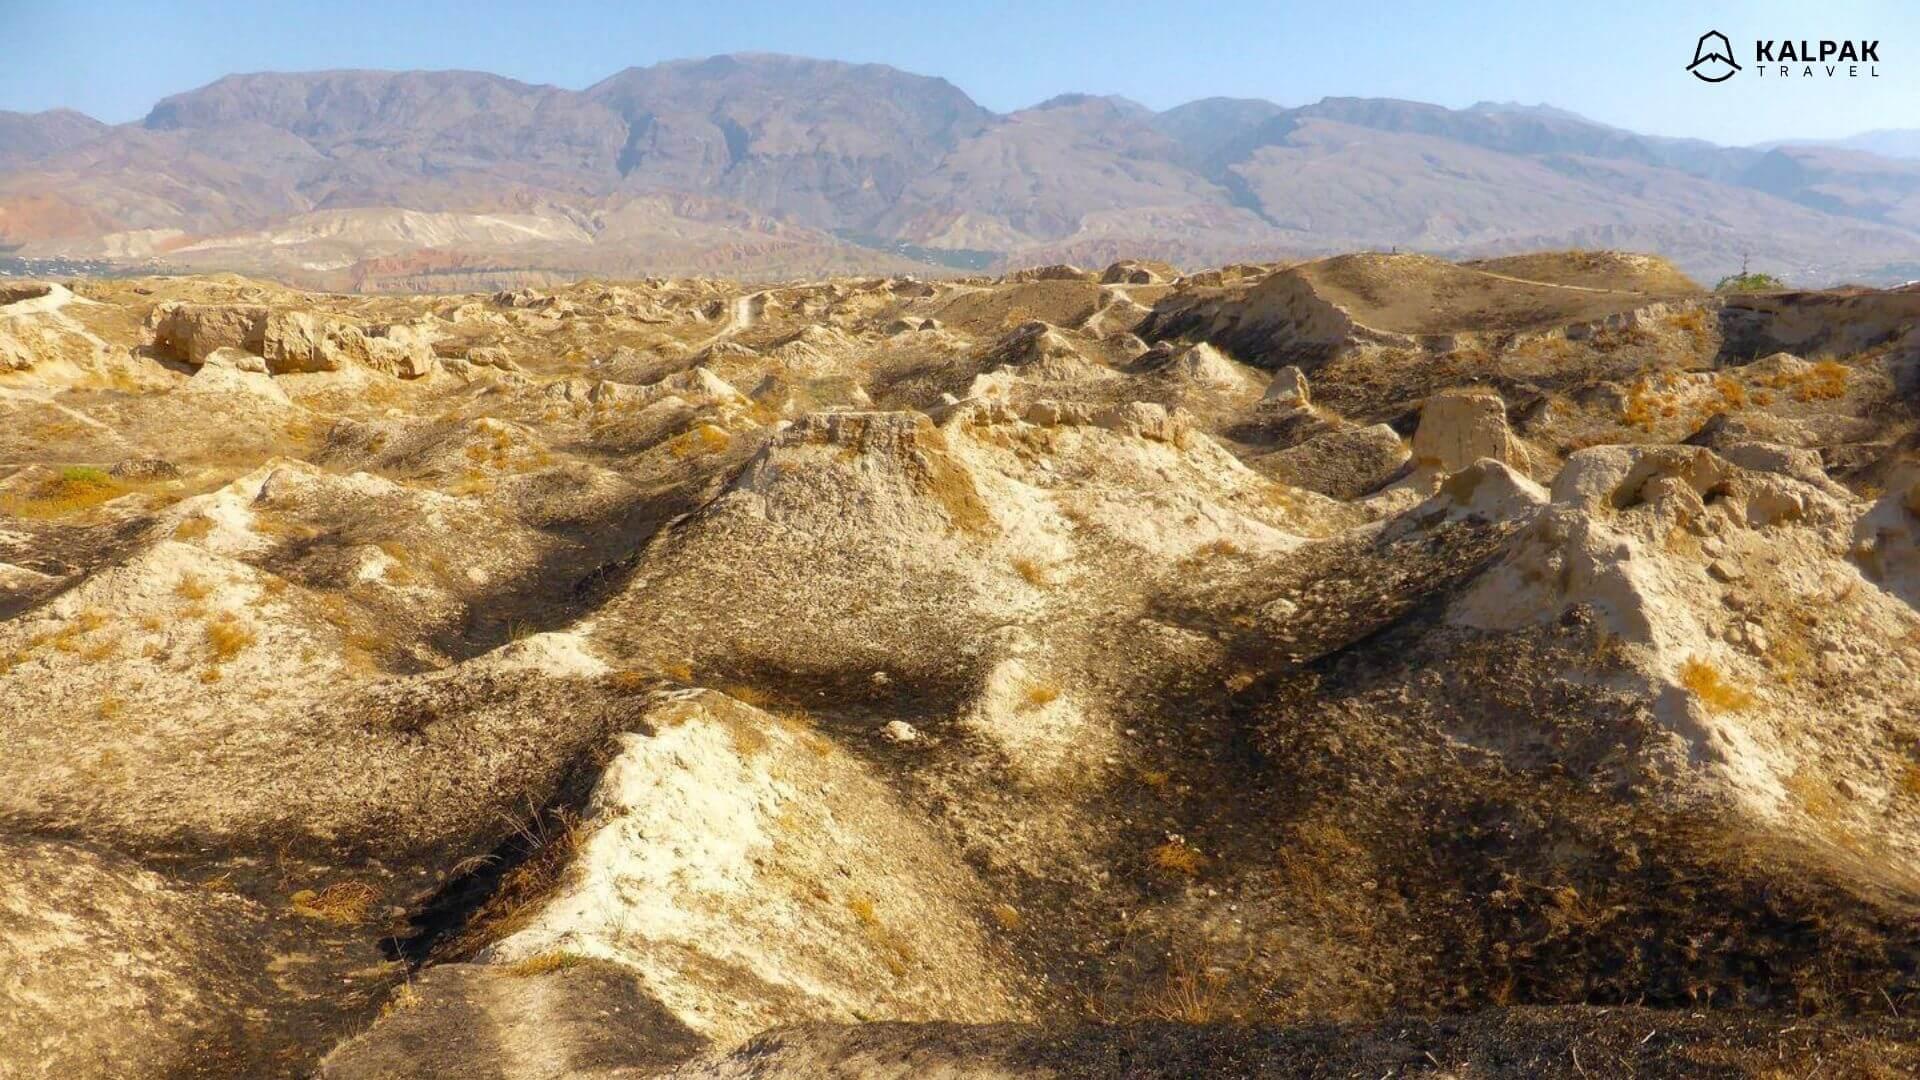 Tajikistan ancient ruins of Penjikent city